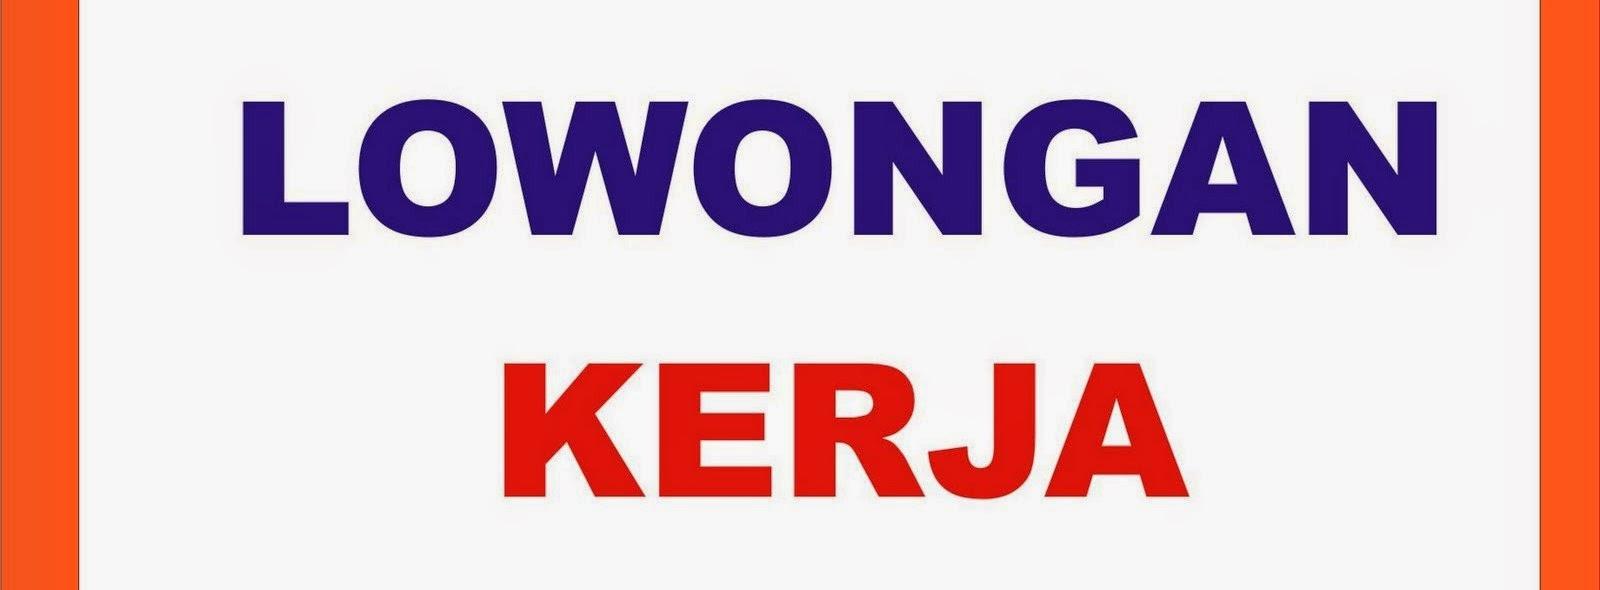 Lowongan Kerja Banten Bulan Mei 2015 Terbaru